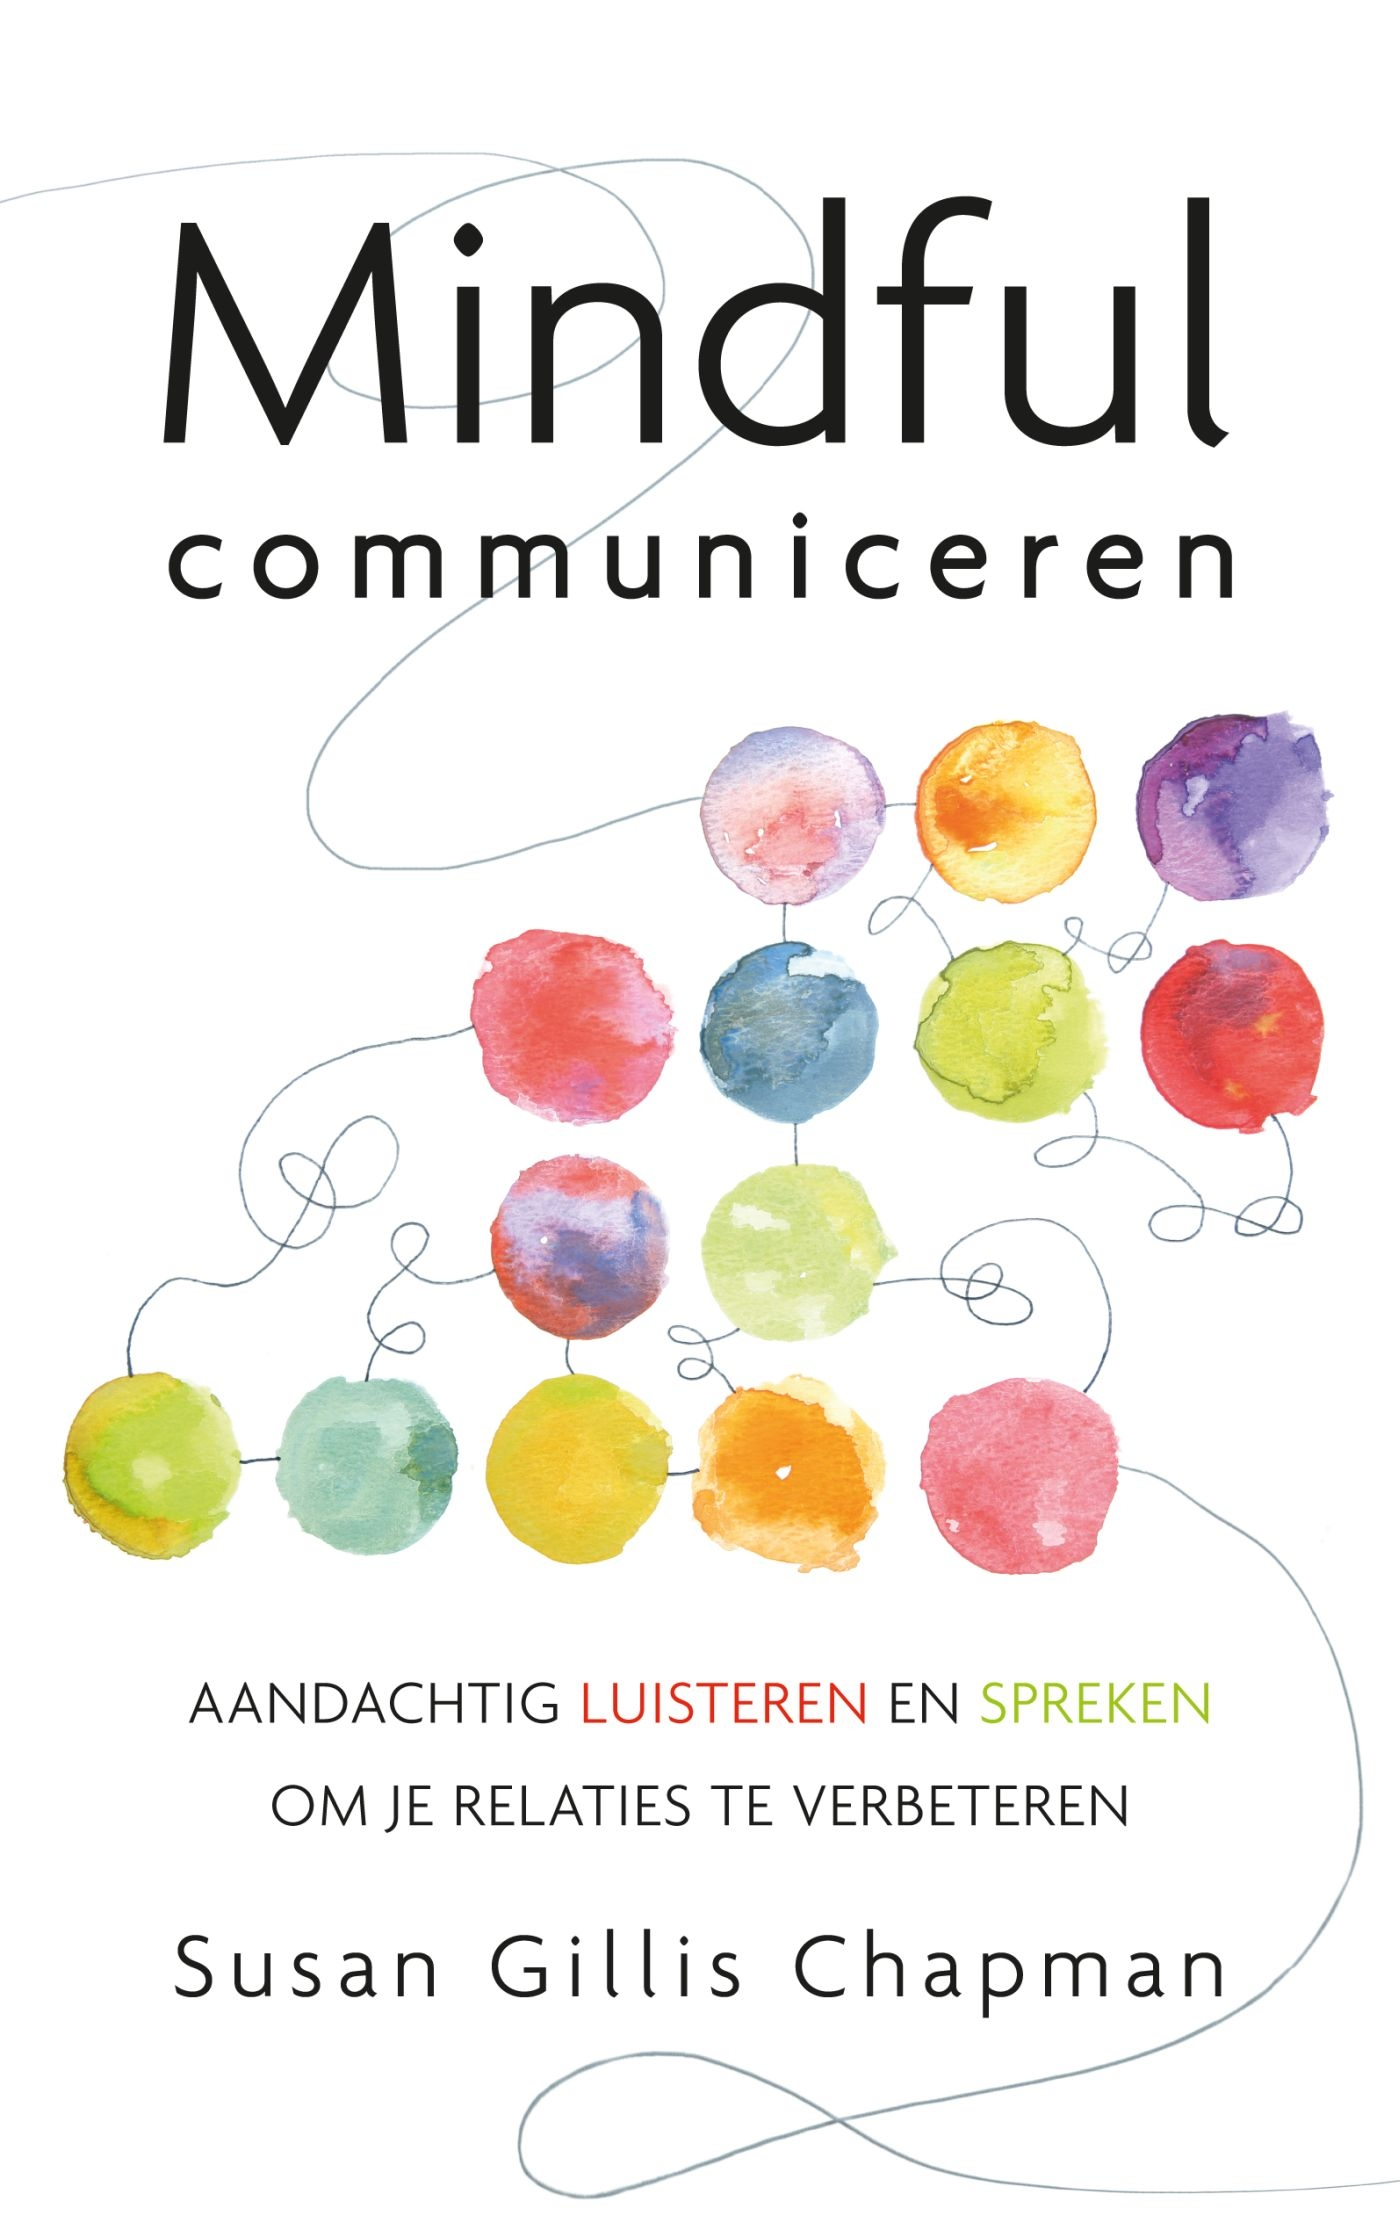 Mindful communiceren – Susan Gillis Chapman